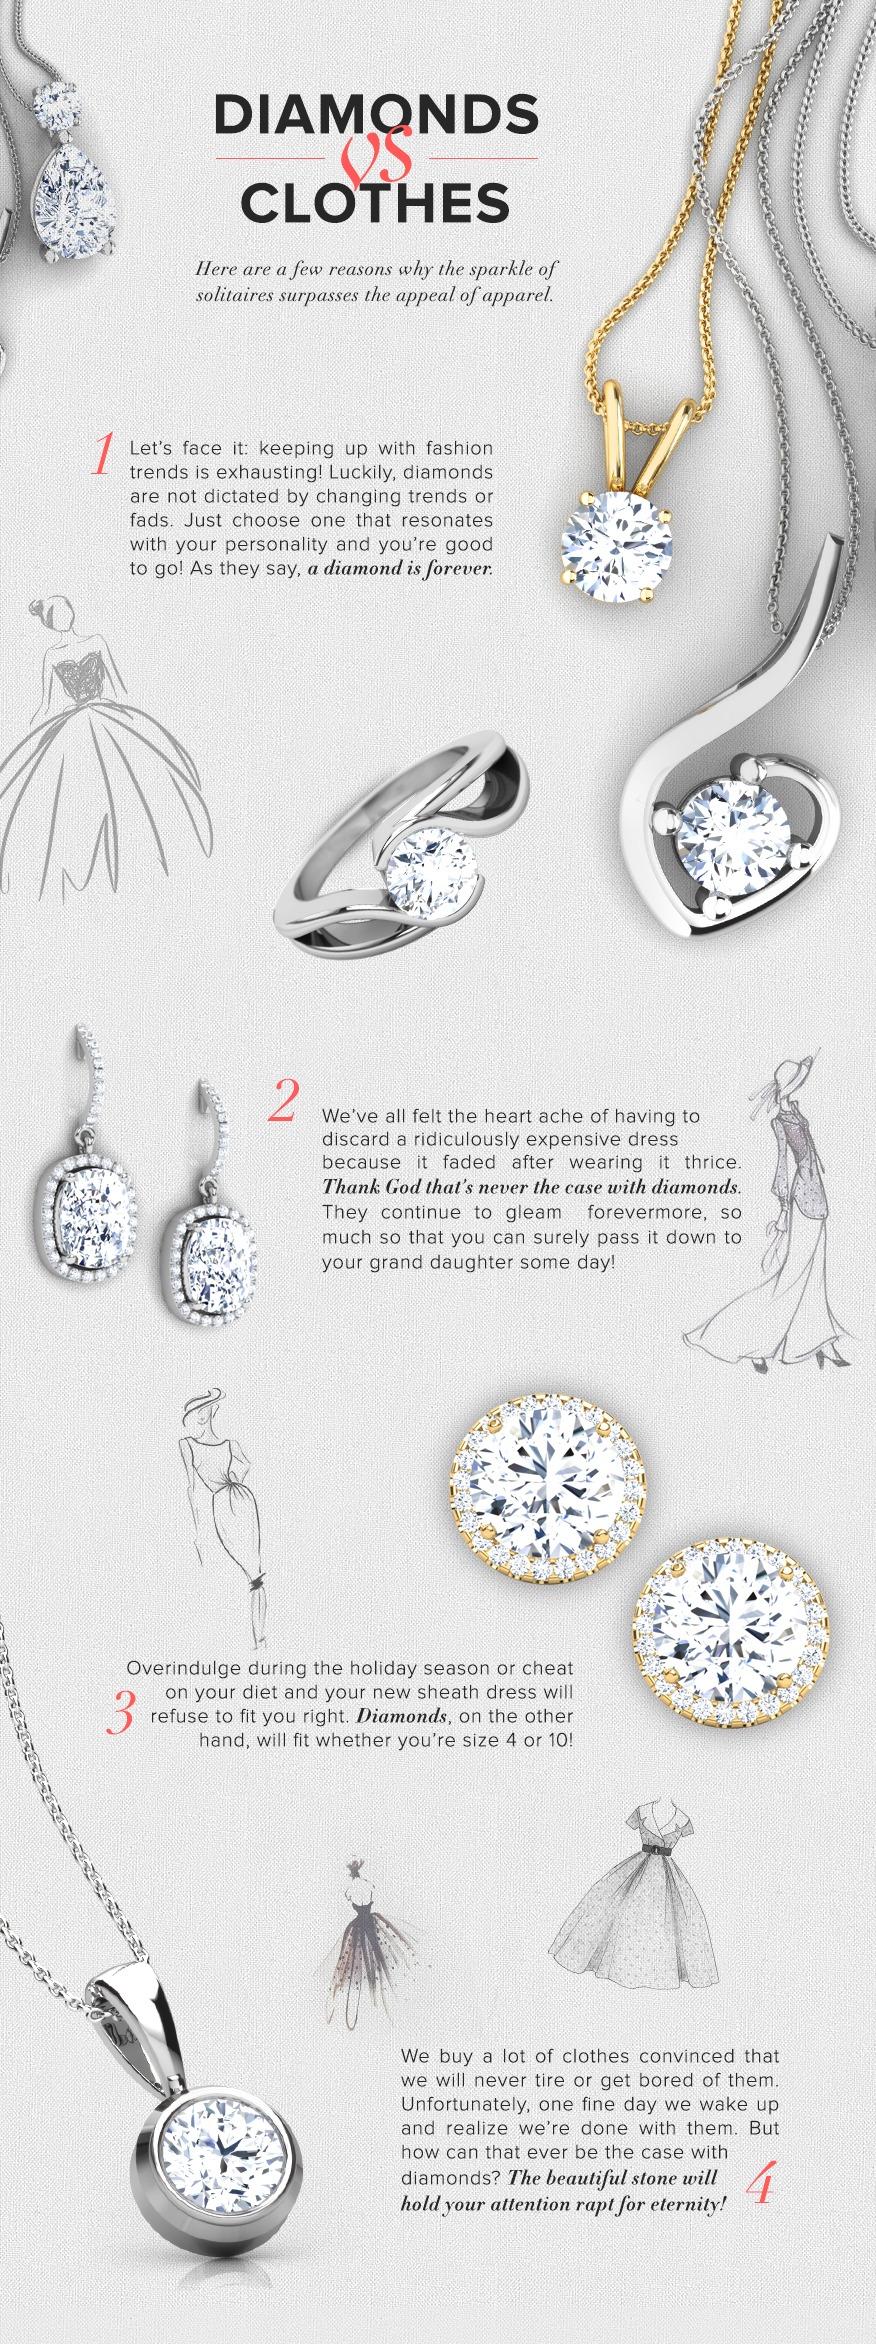 V-DAY EDITION: DIAMONDS VS DRESSES